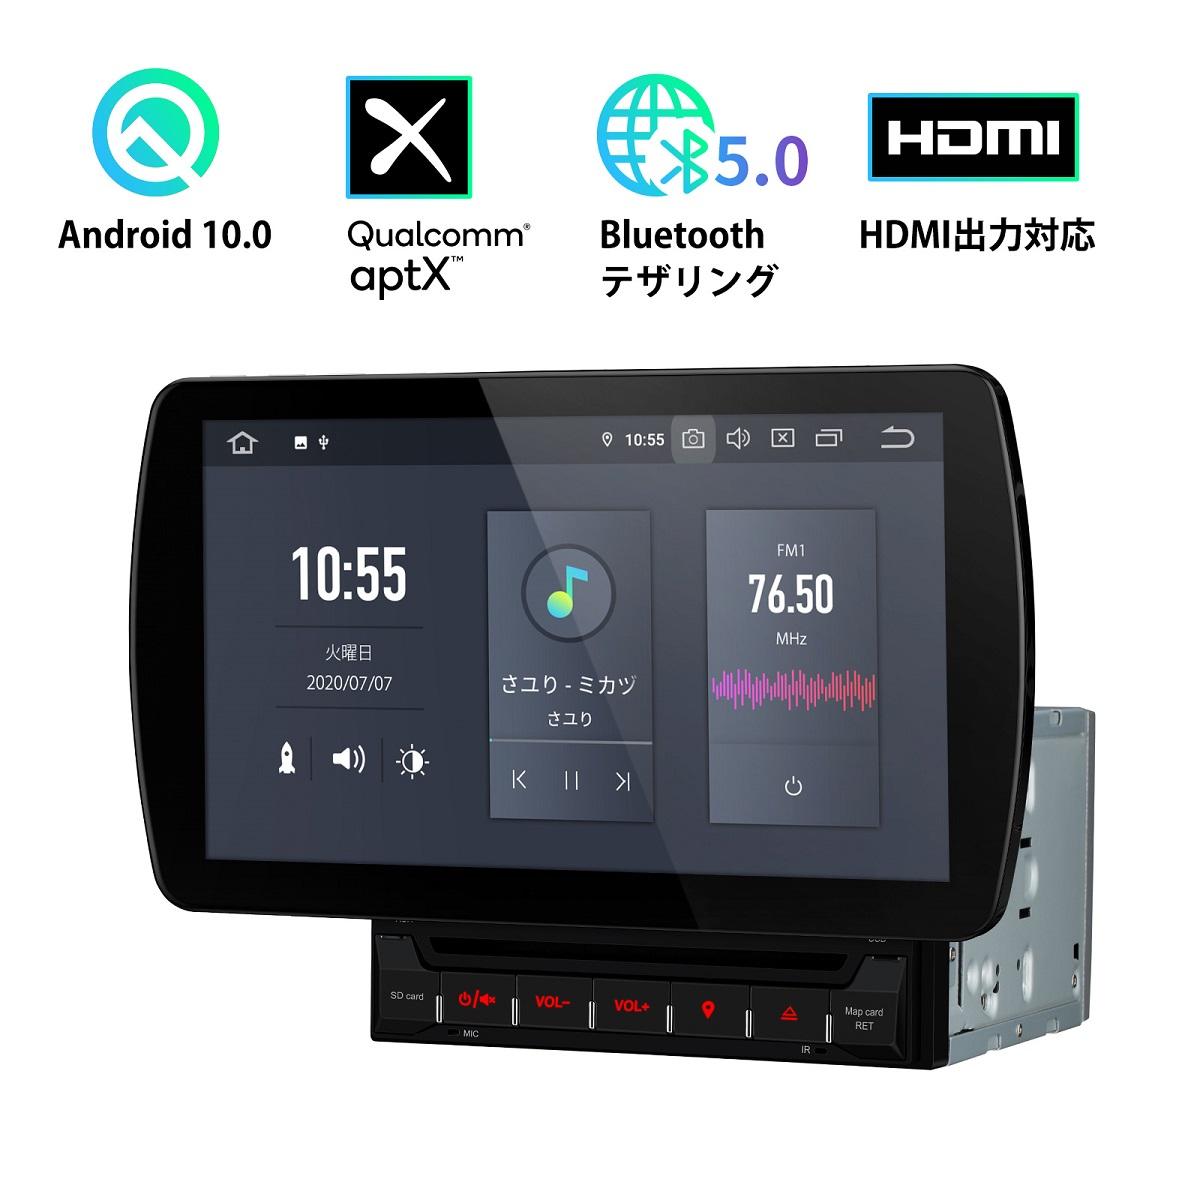 (TQ100)カーナビ 2DIN XTRONS Android10.0 カーオーディオ 10インチ 6コア 車載PC HDMI出力 4GB+64GB Bluetooth OBD2 4G WIFI ミラーリング DVR aptX